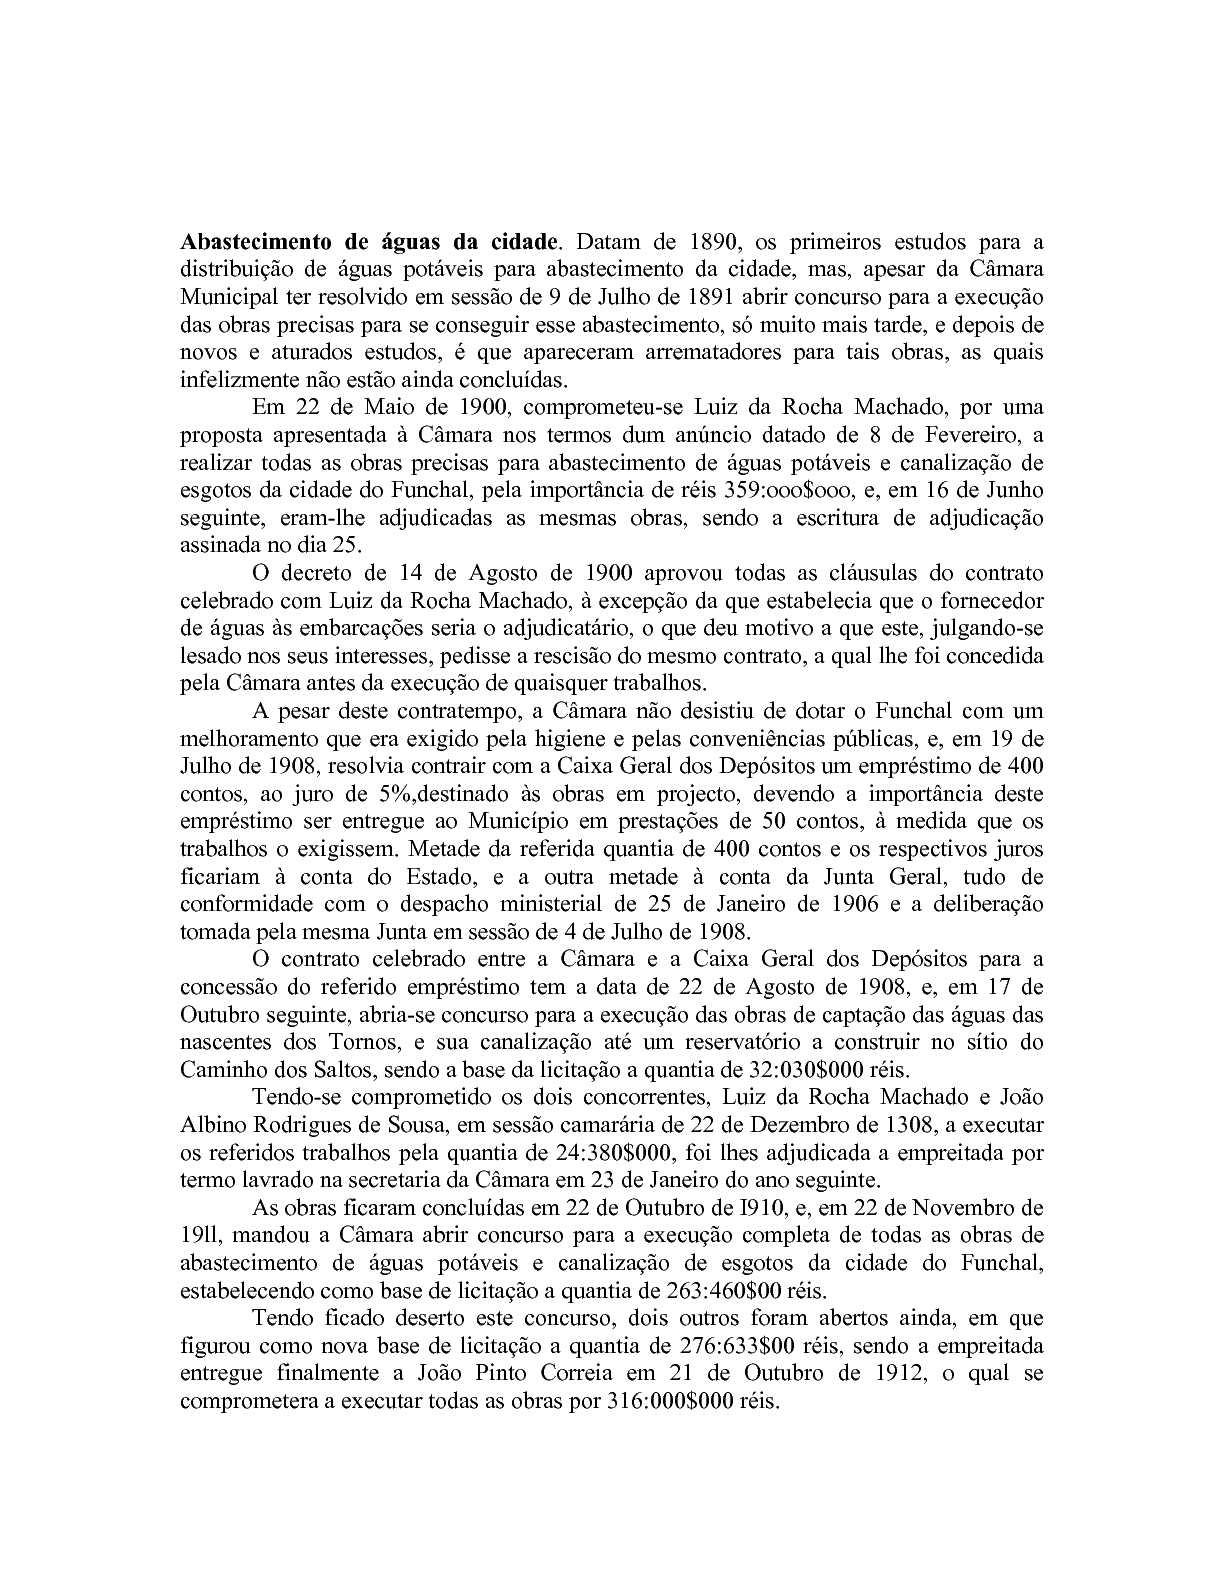 Calaméo - 1929-elmad 40813c3b3a